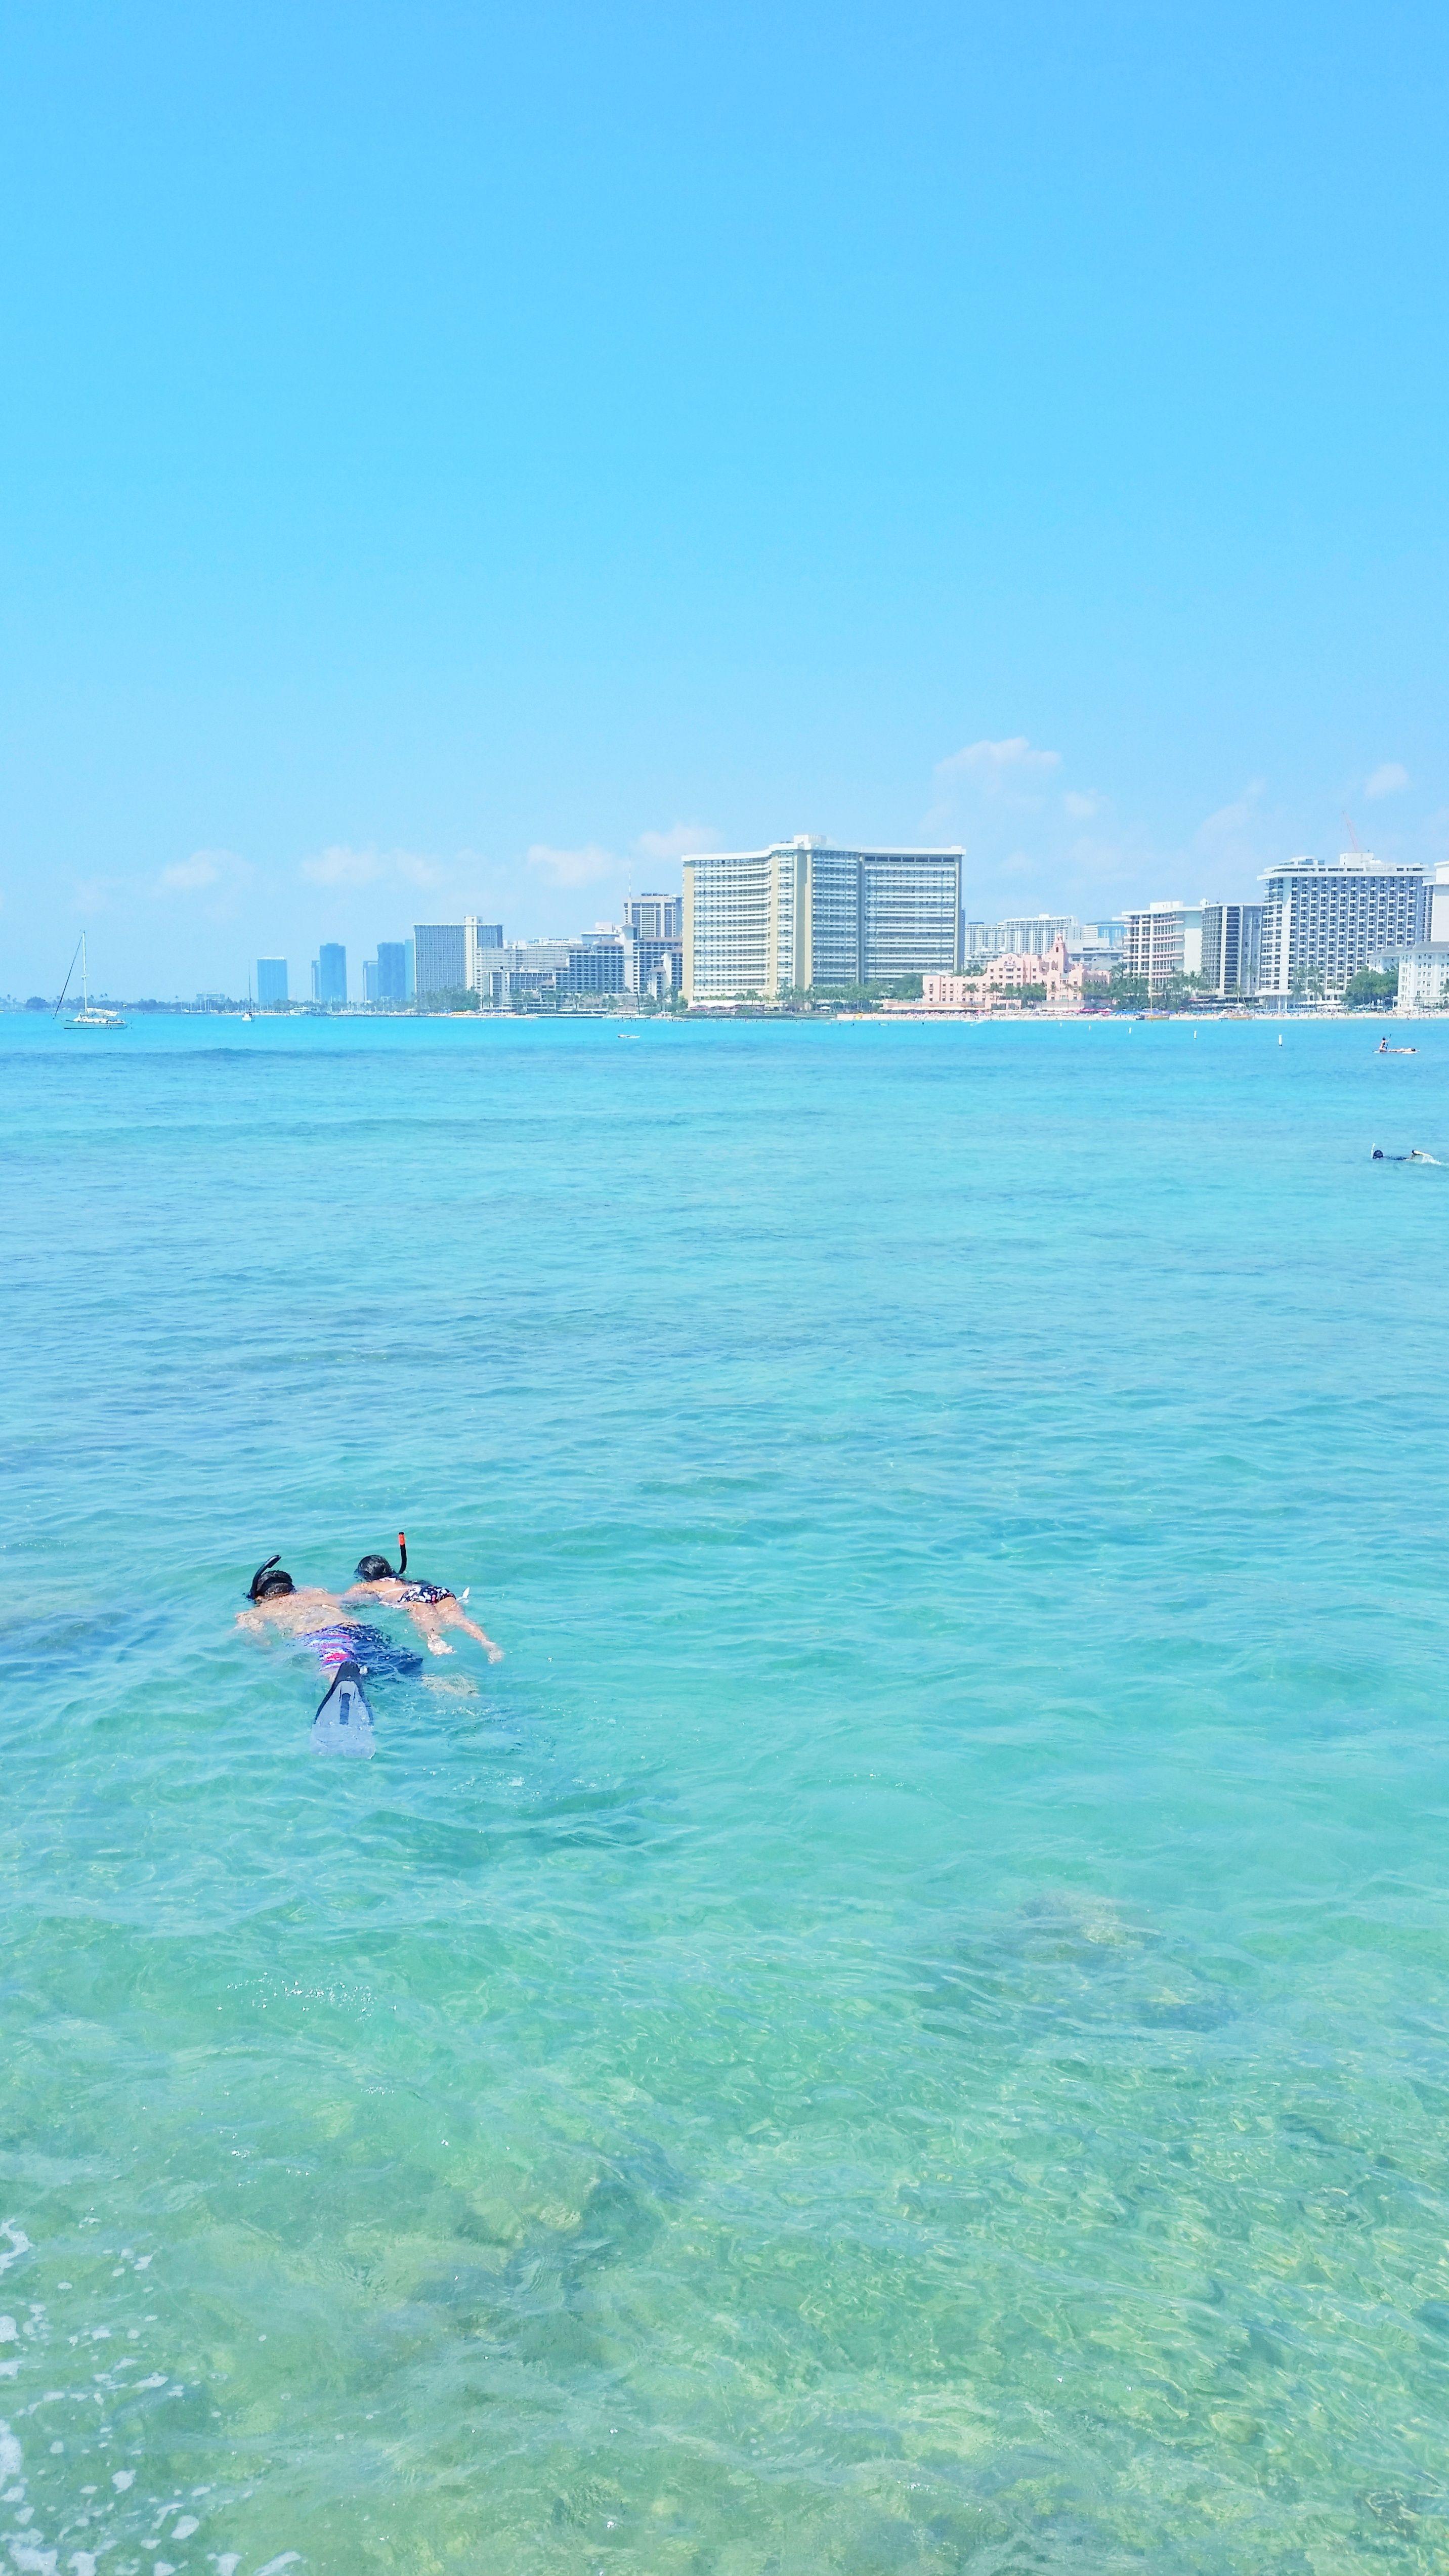 Waikiki Snorkeling: Best Spot To Snorkel In Waikiki